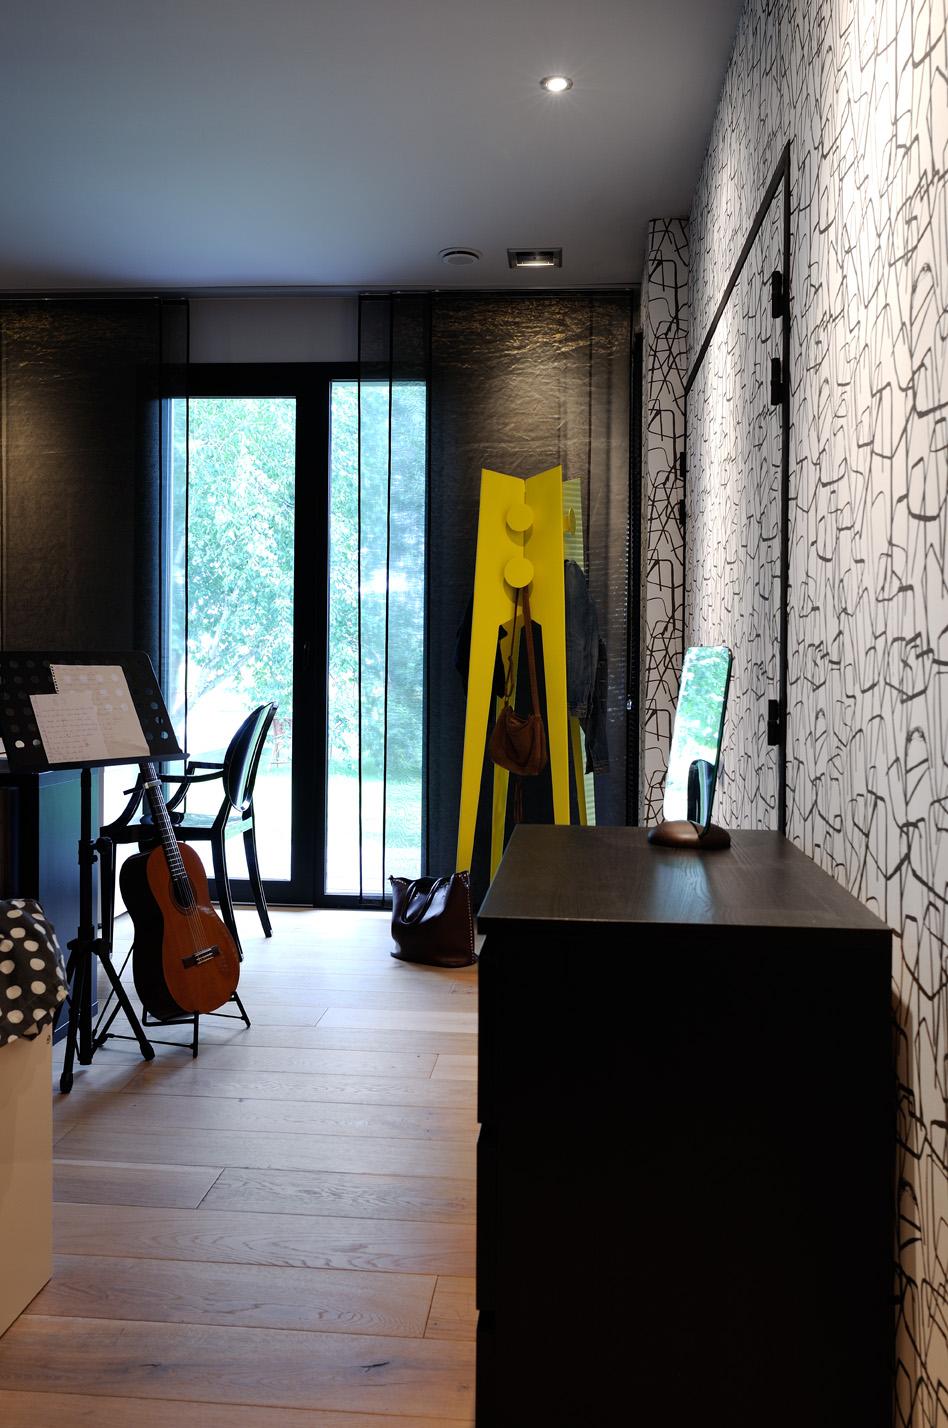 mati re grise mobilier design green art le showroom gen ve